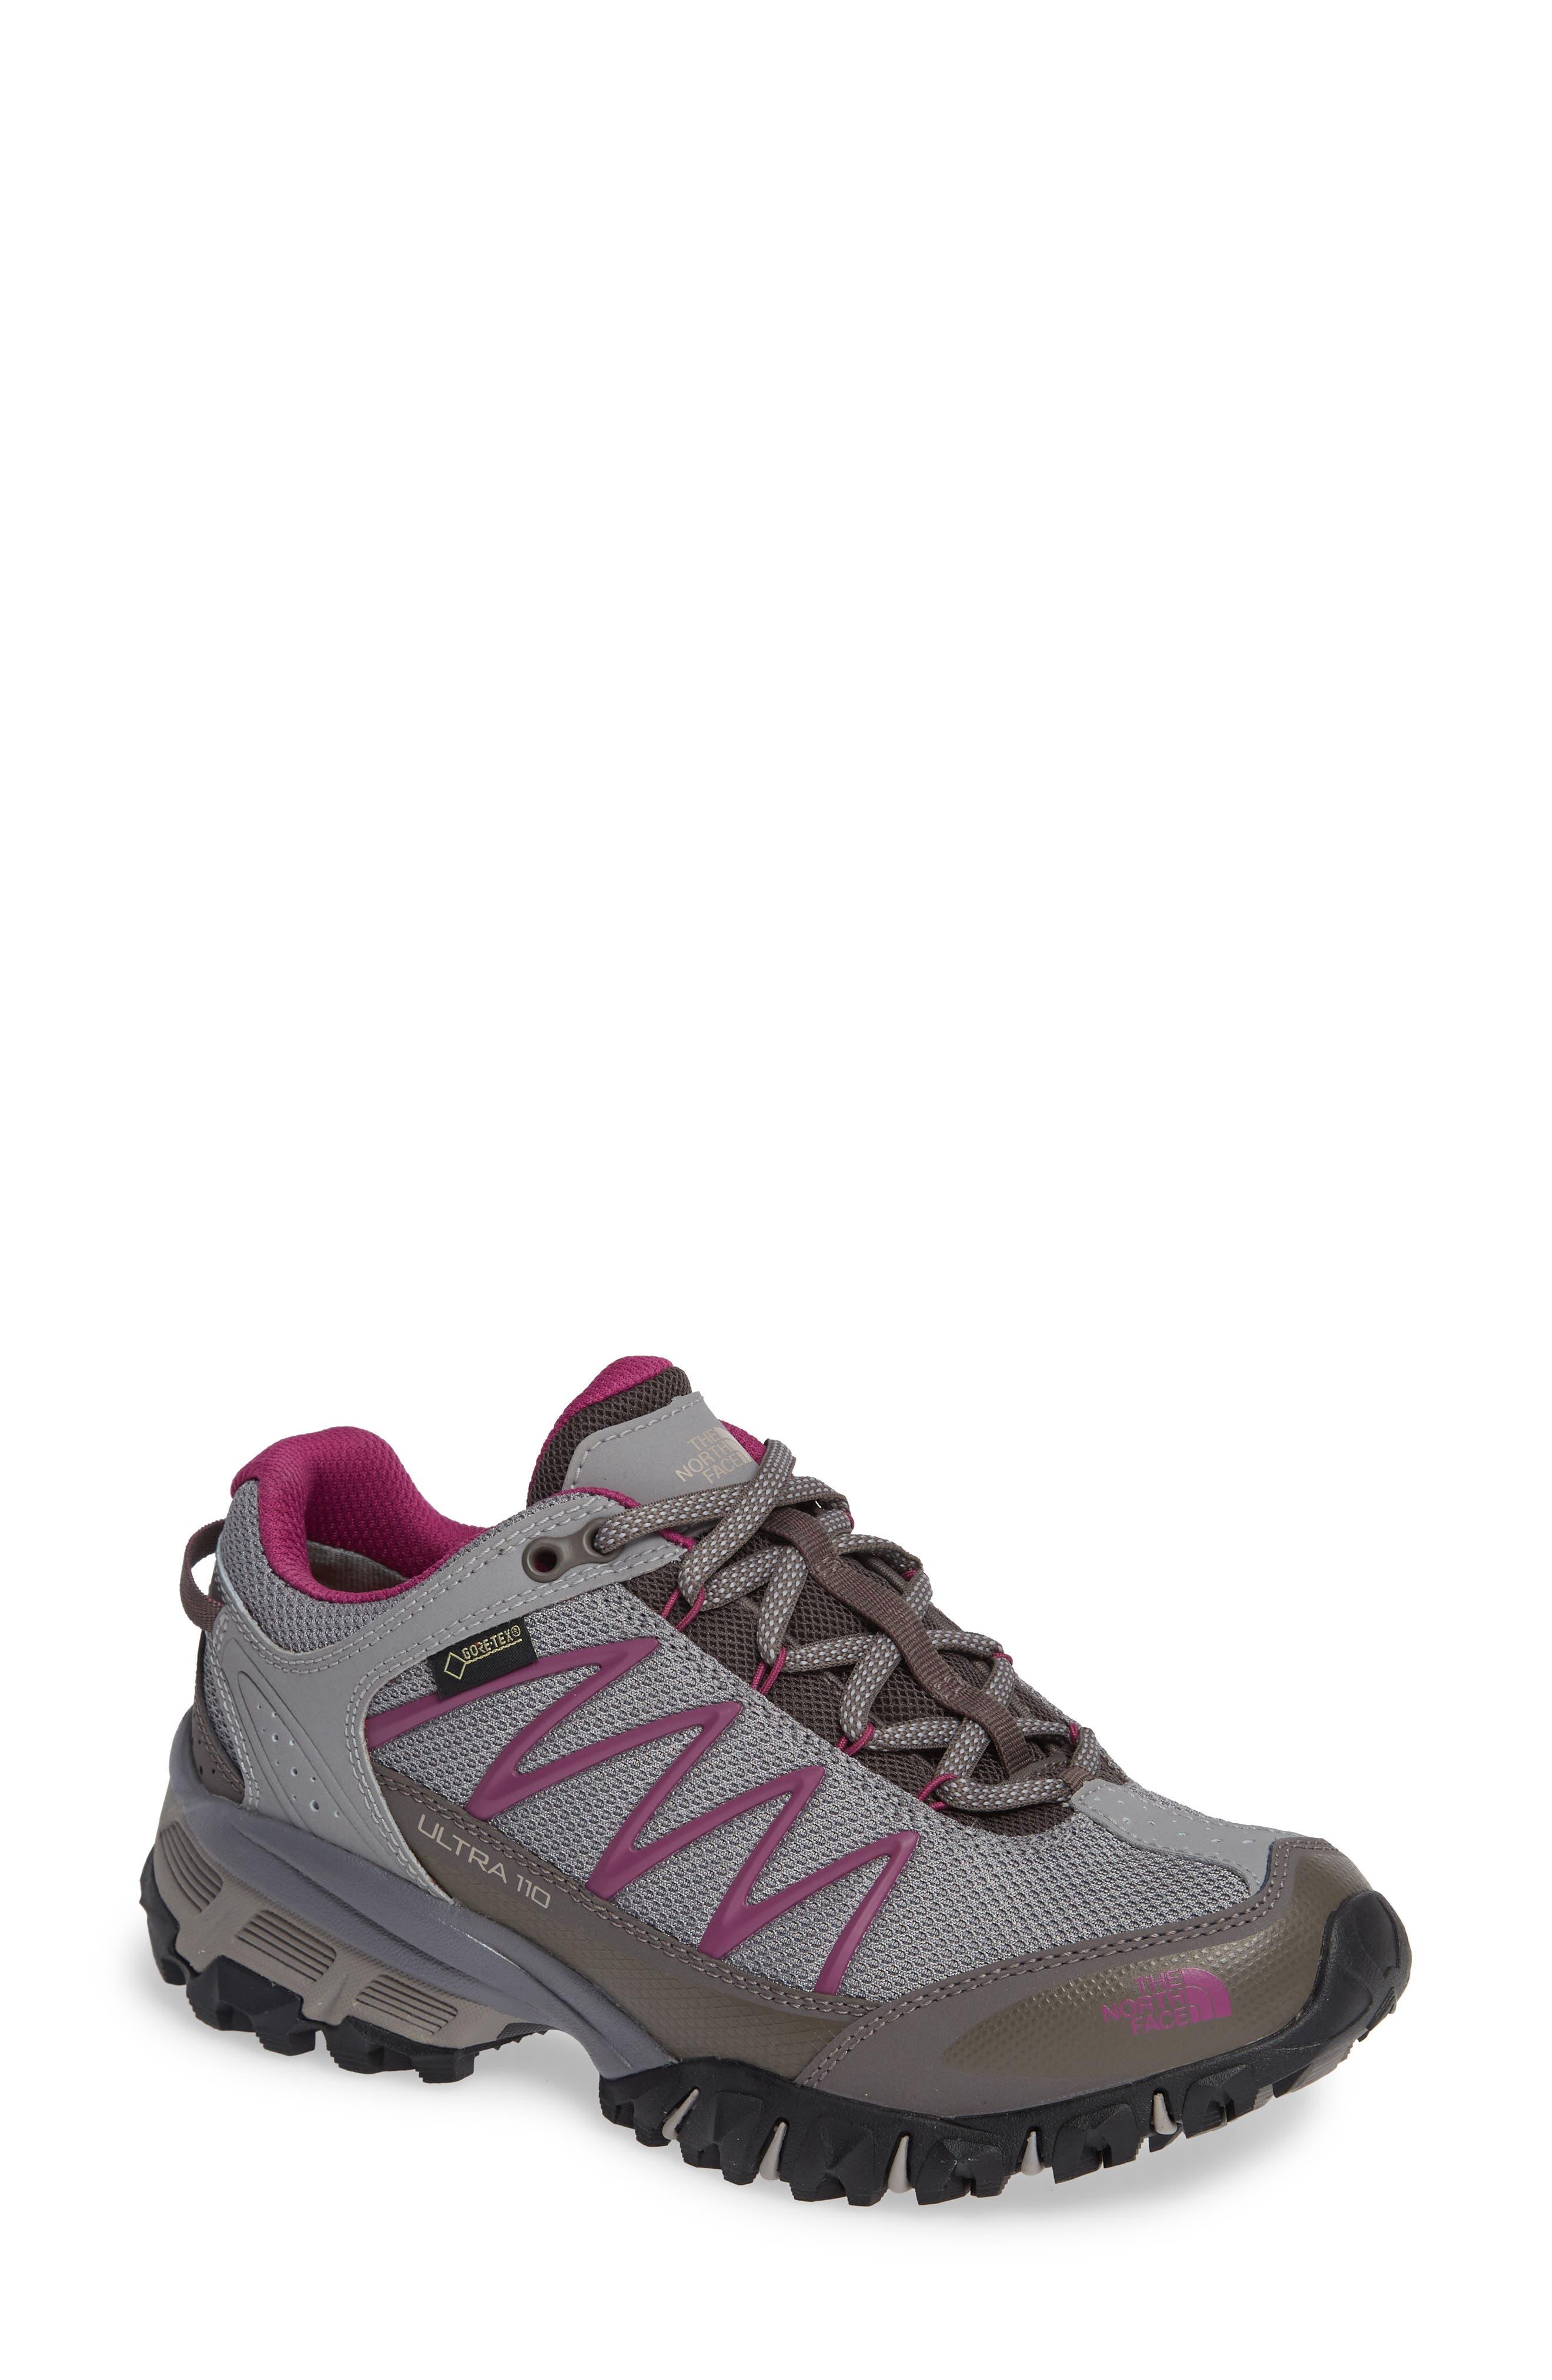 Ultra 110 GTX<sup>®</sup> Hiking Shoe,                             Main thumbnail 1, color,                             Q-SILVER GREY/ ASTER PURPLE